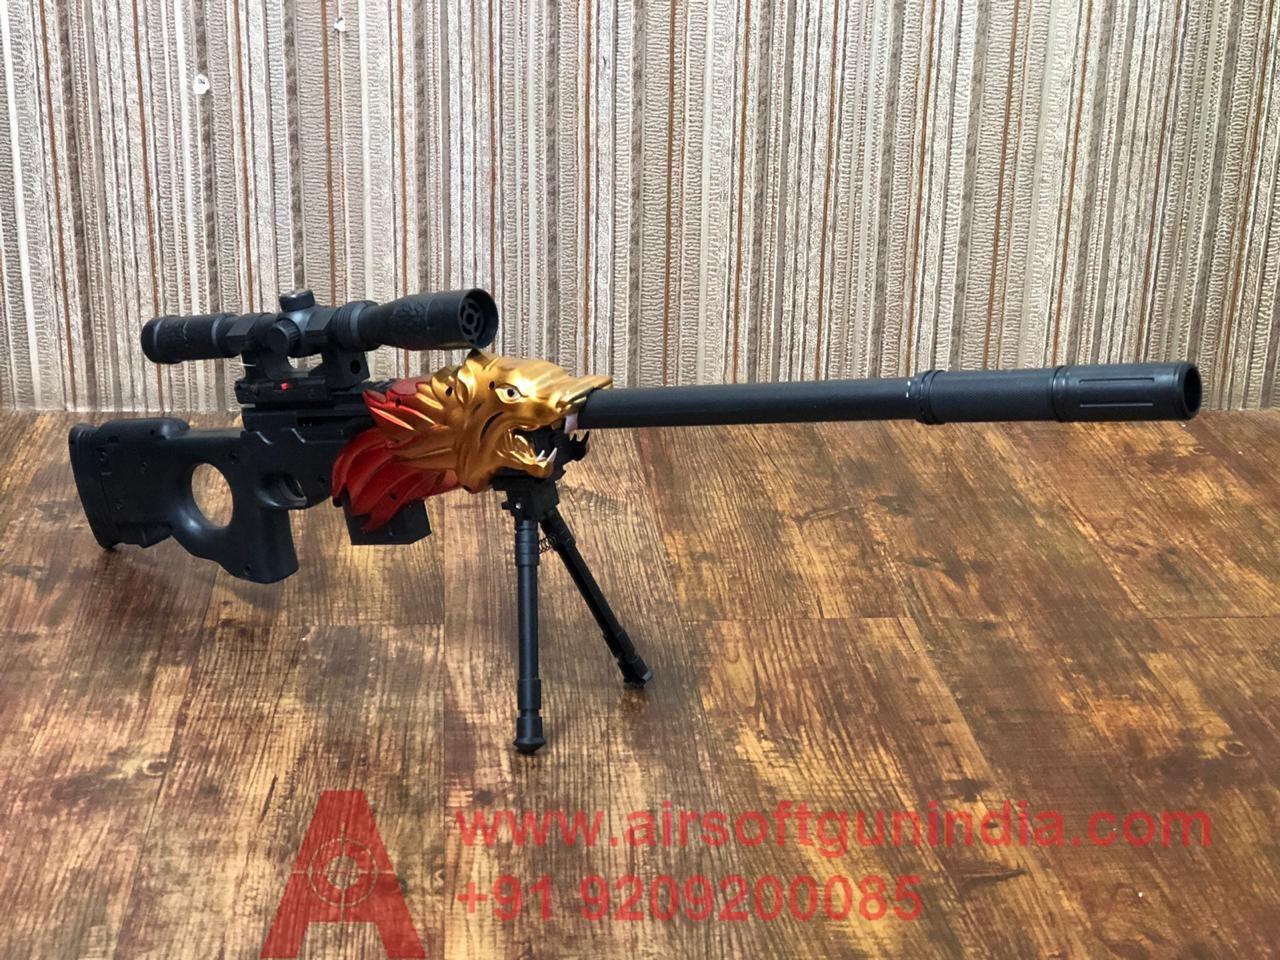 L96 Lion Sniper Rifle By Airsoft Gun India